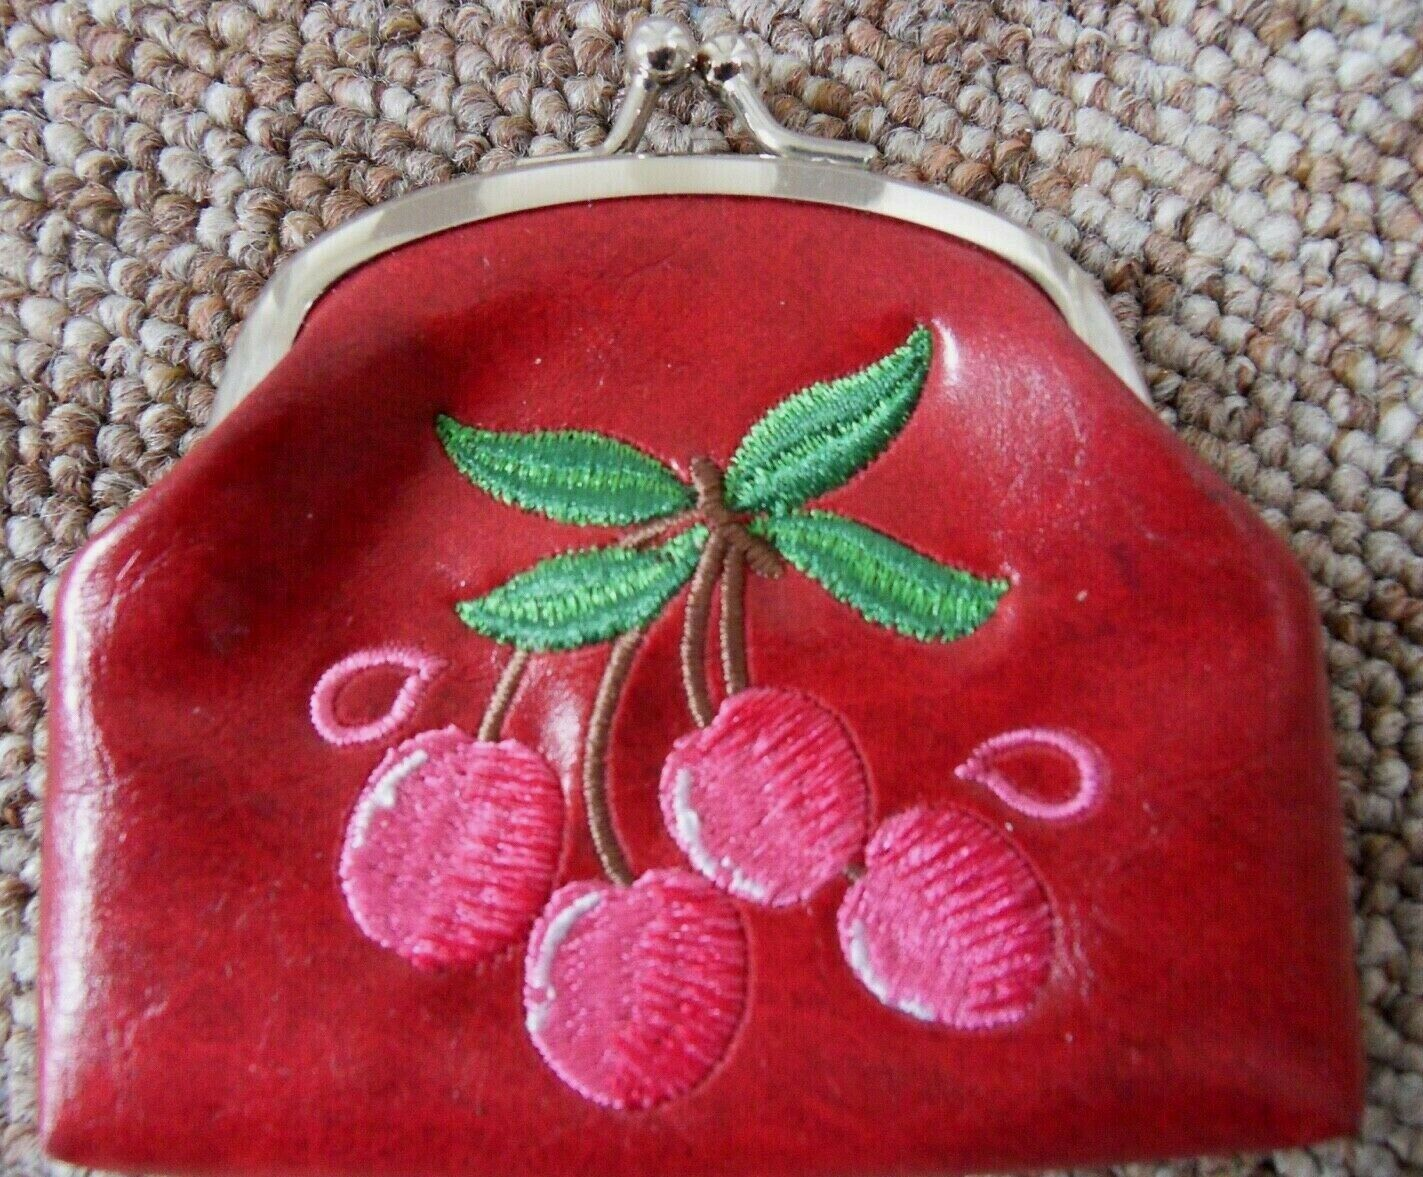 Lavishy Vegan Ladies Leather Coin Wallet clutch Embroidered Cherries Design